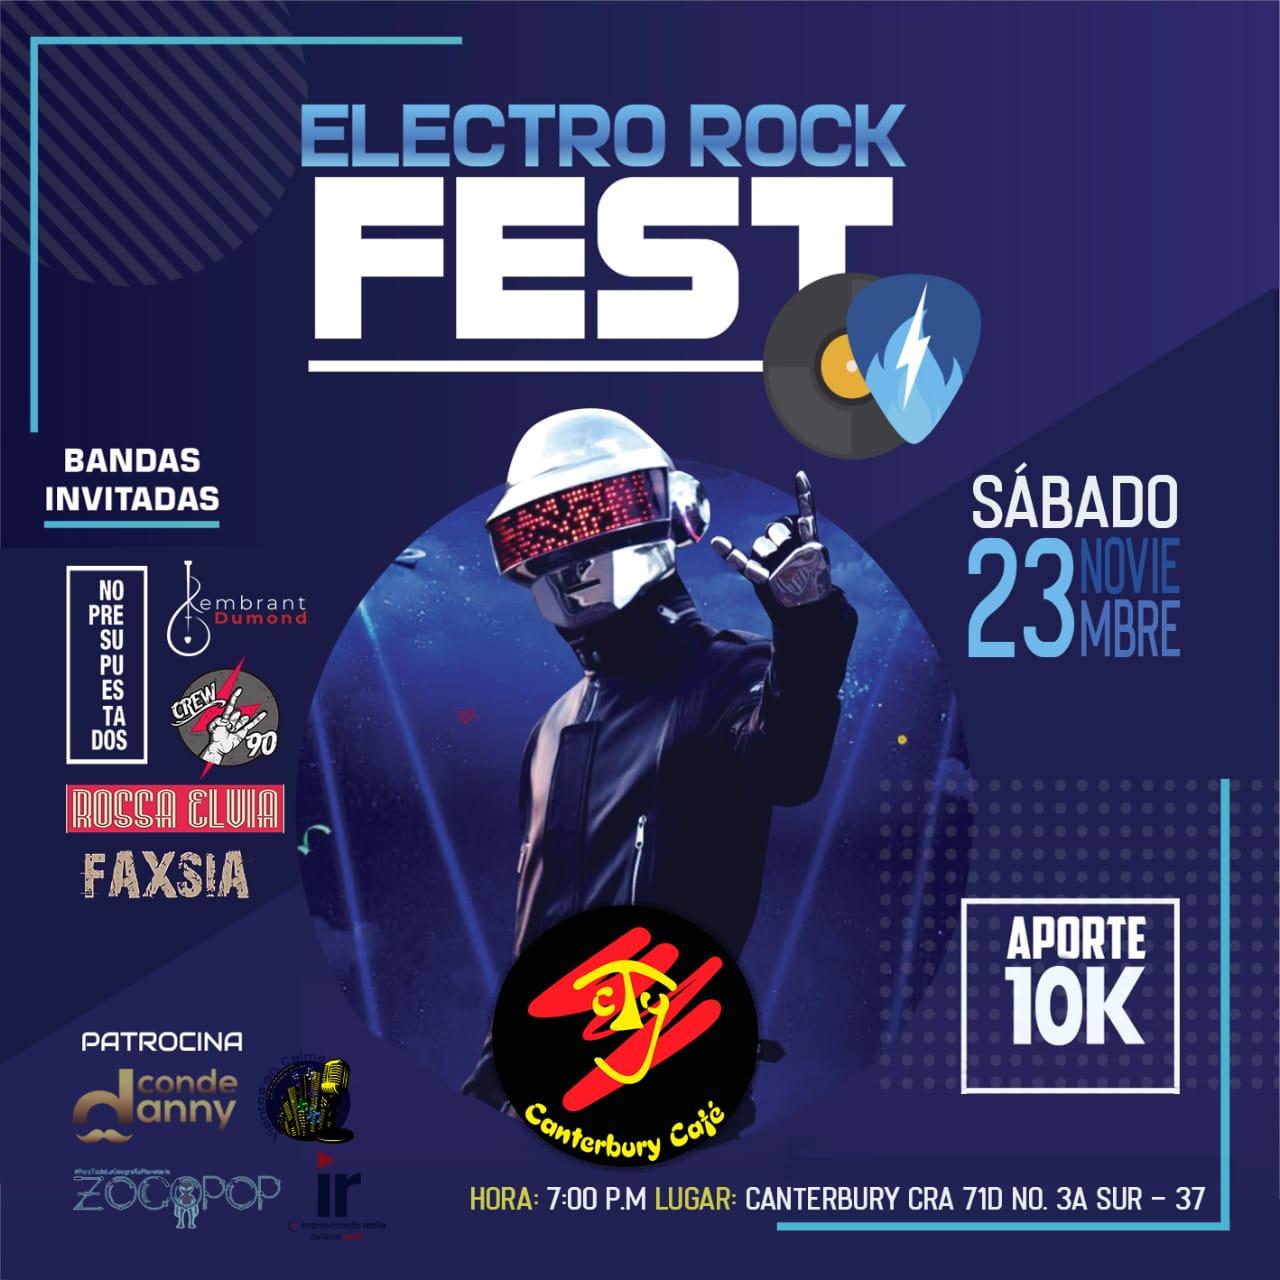 Electro Rock Fest